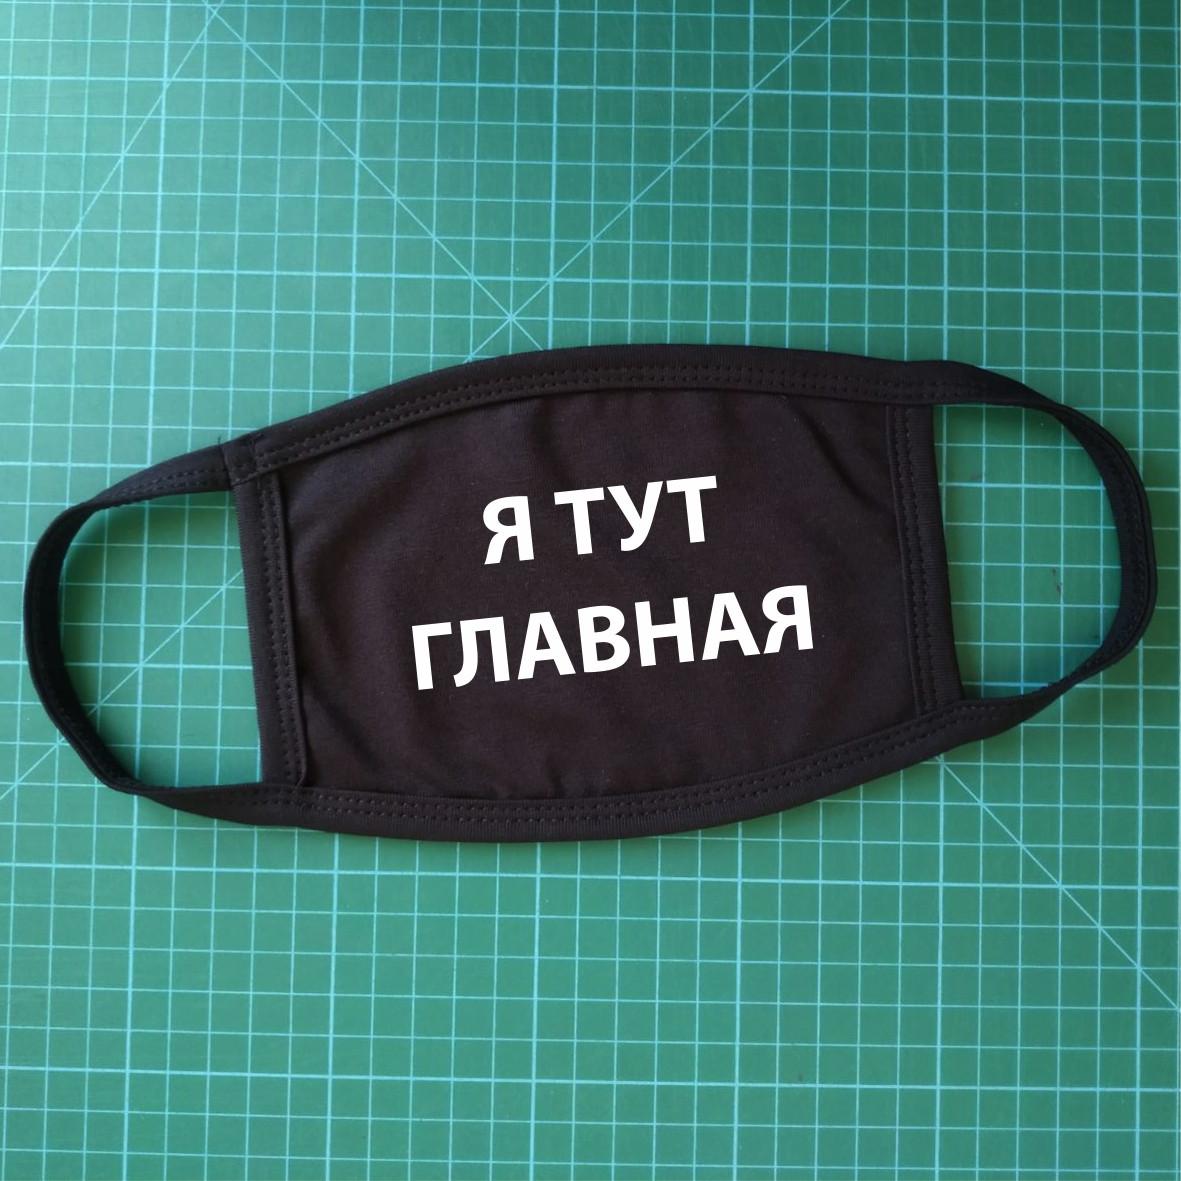 Тканевая сувенирная маска для лица. Я тут главная